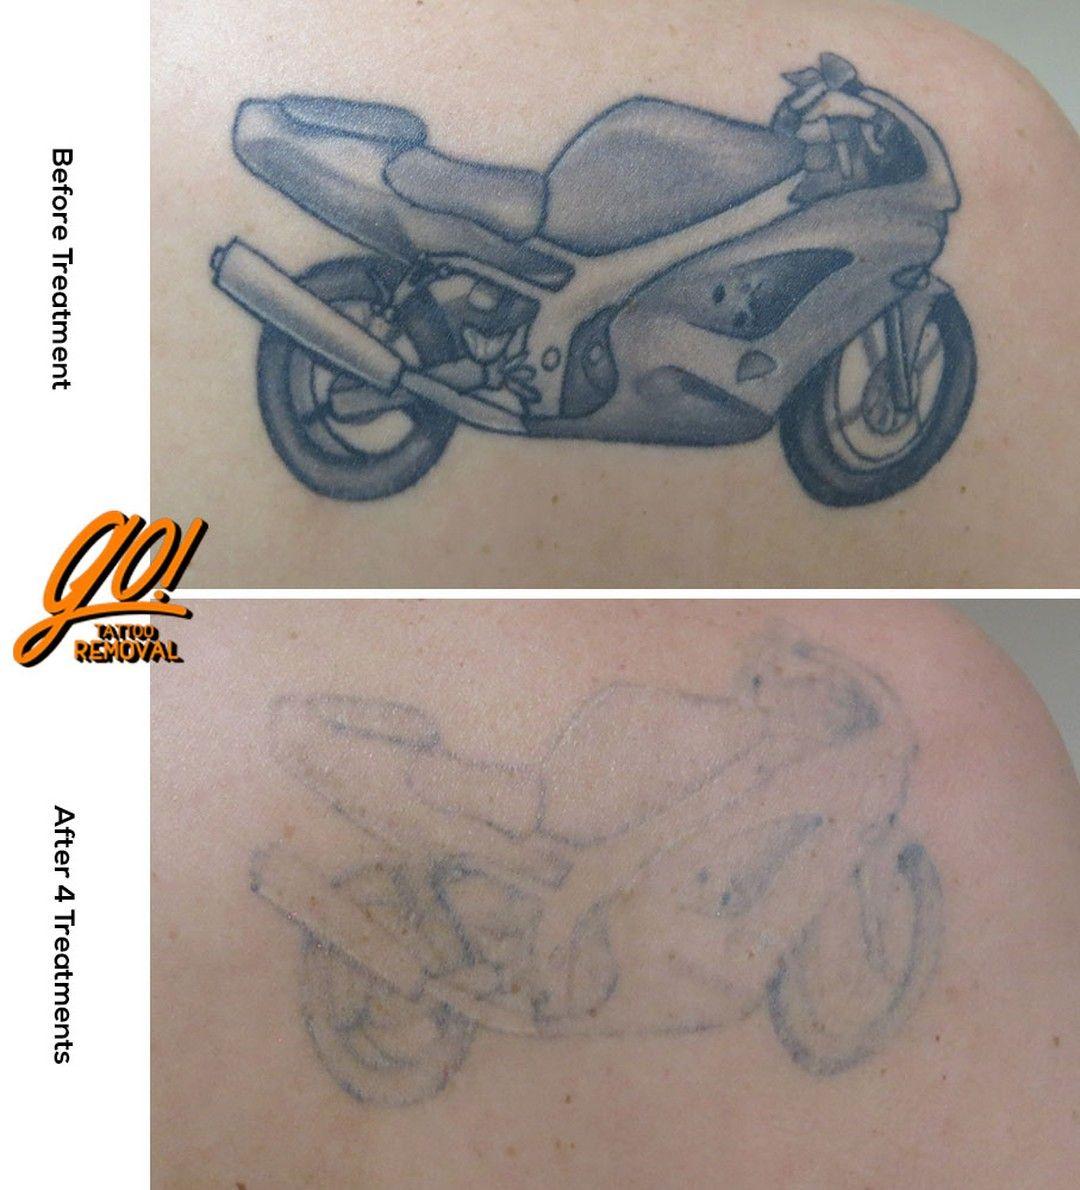 Pin on Tattoo Removal In Progress